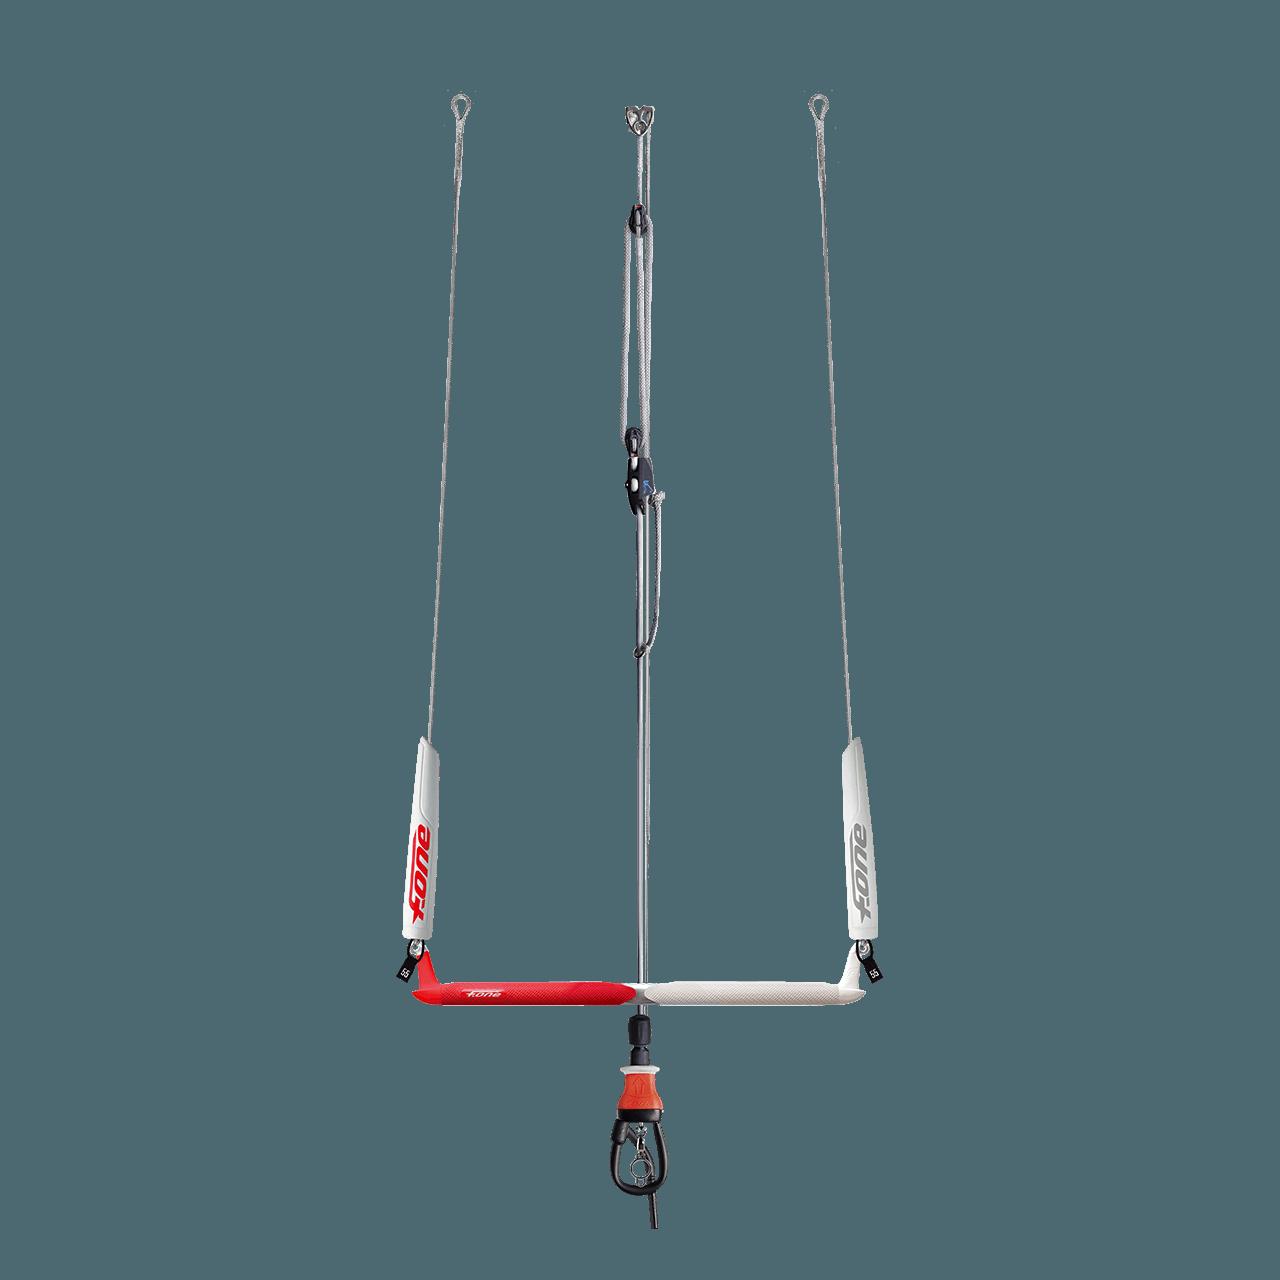 Kitebar DIABLO V 4 - F-ONE